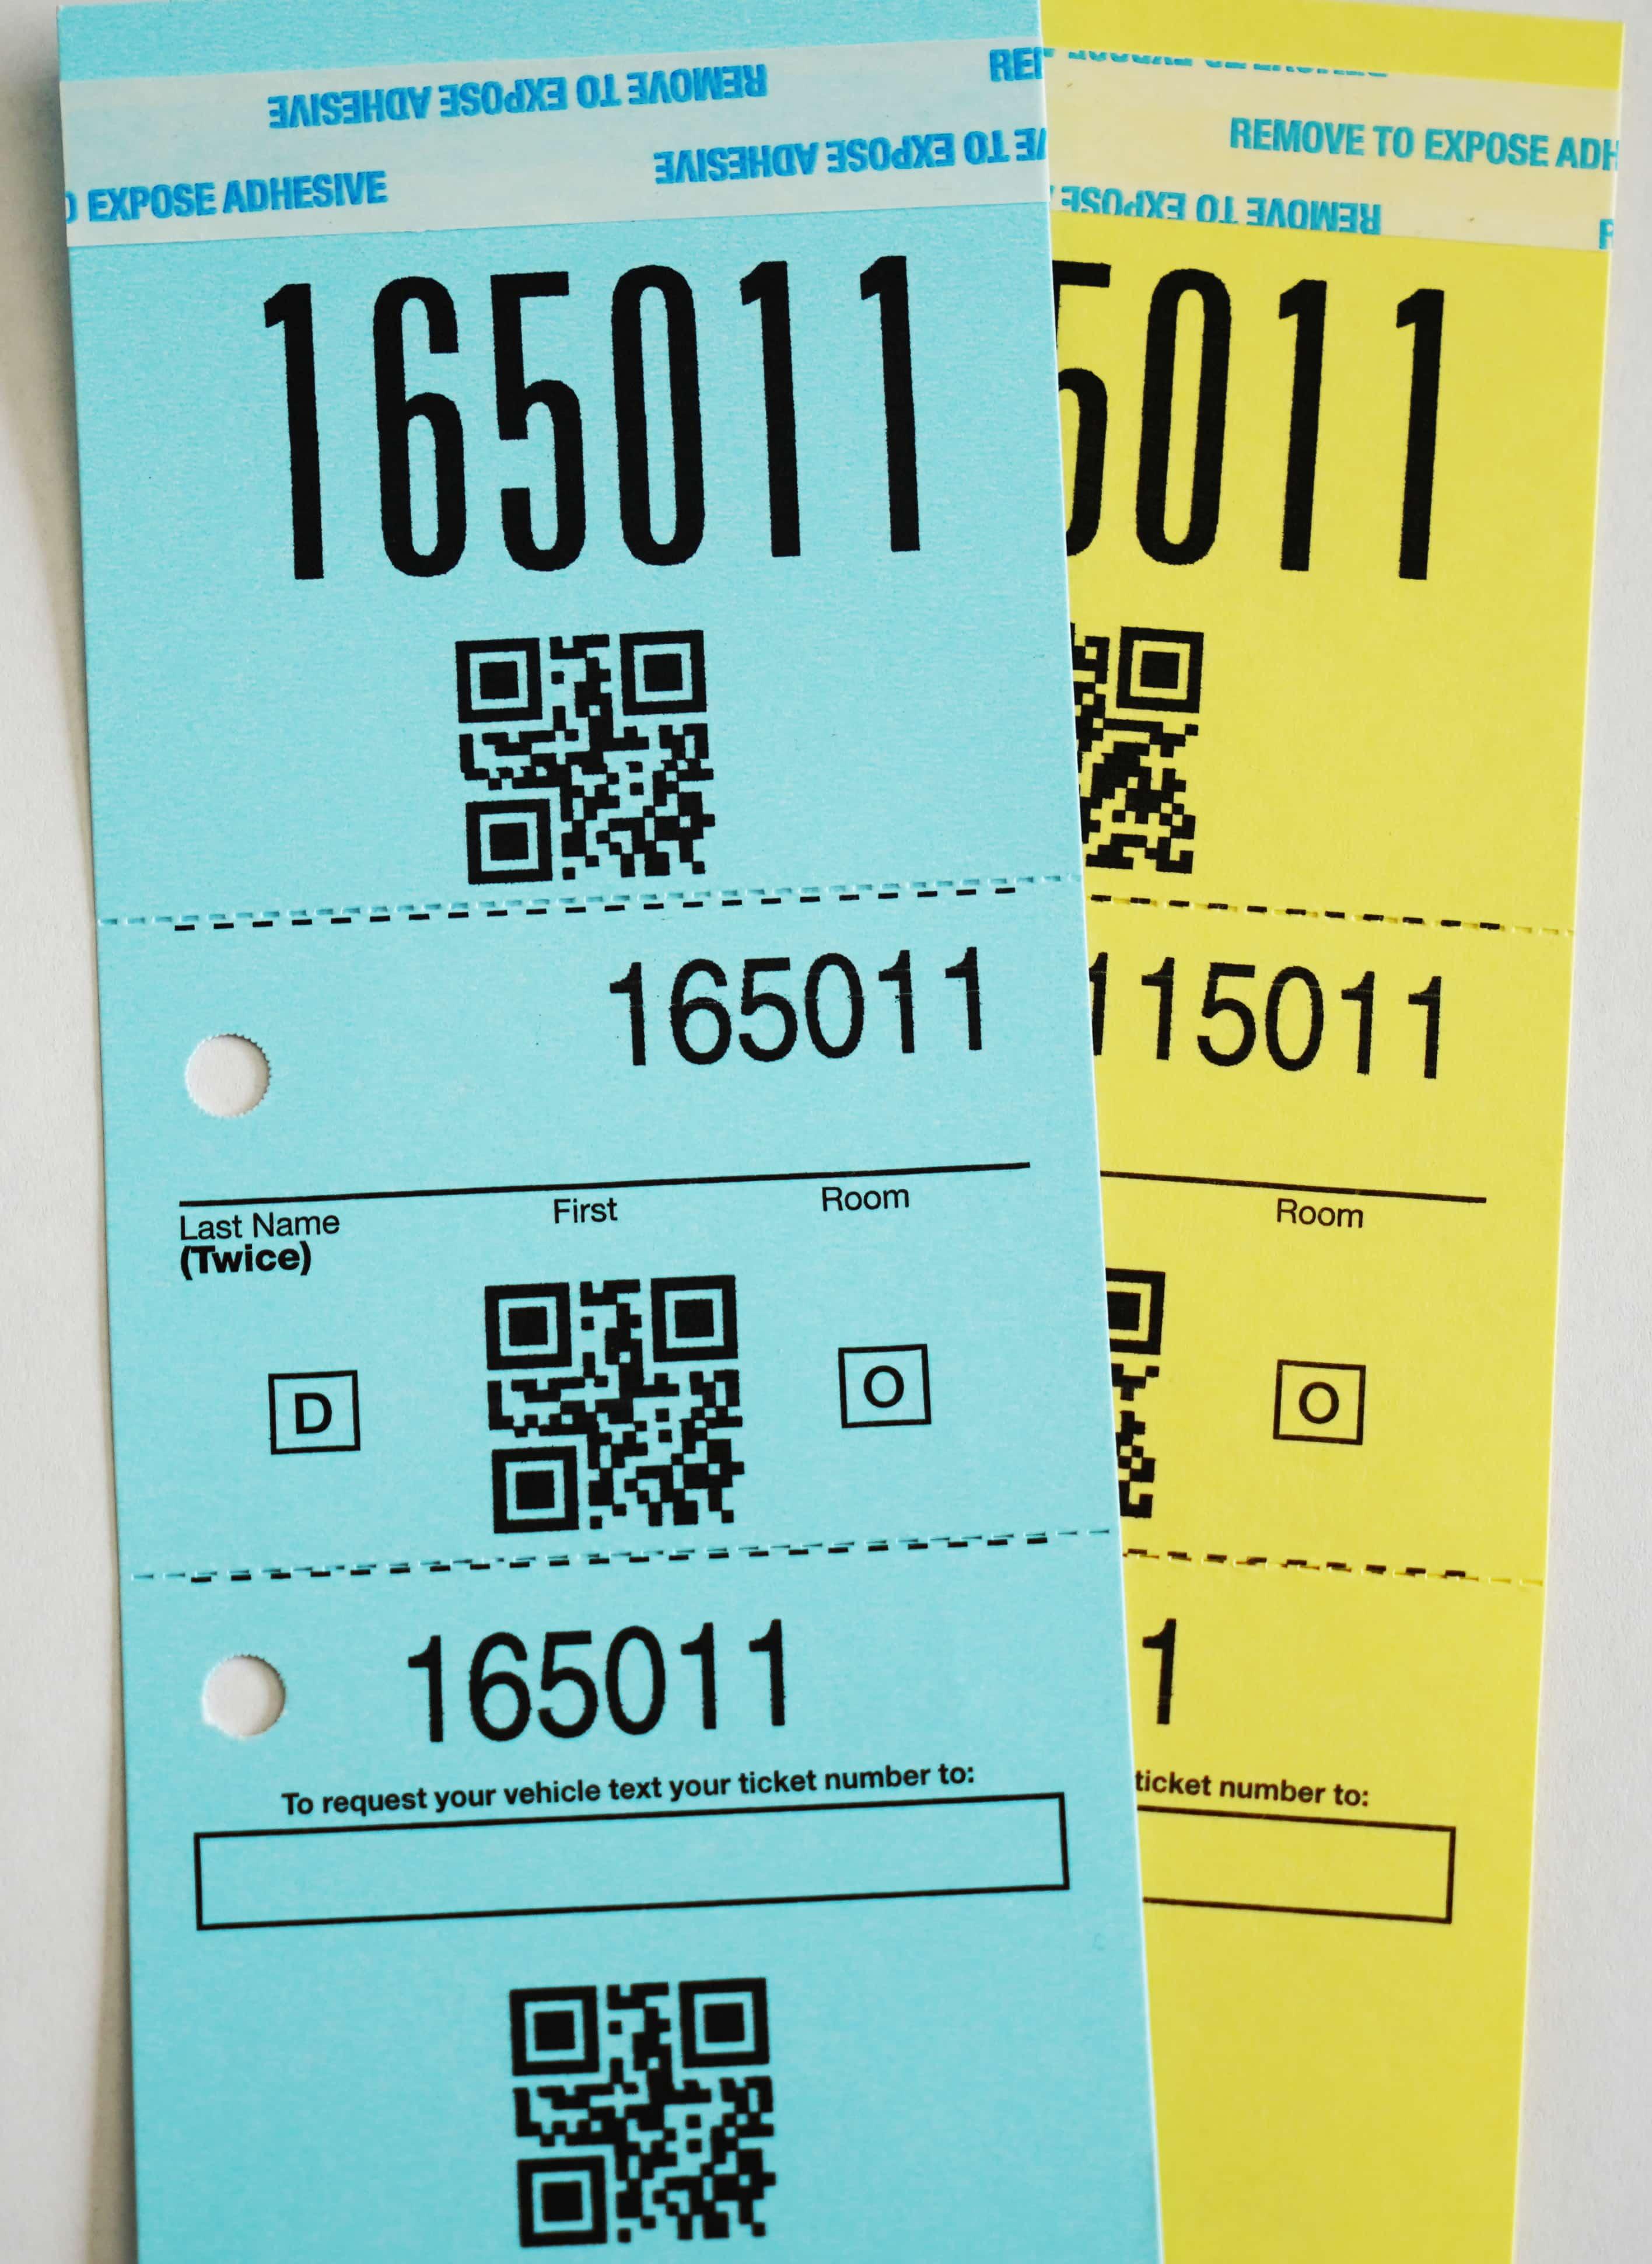 Valet ticket